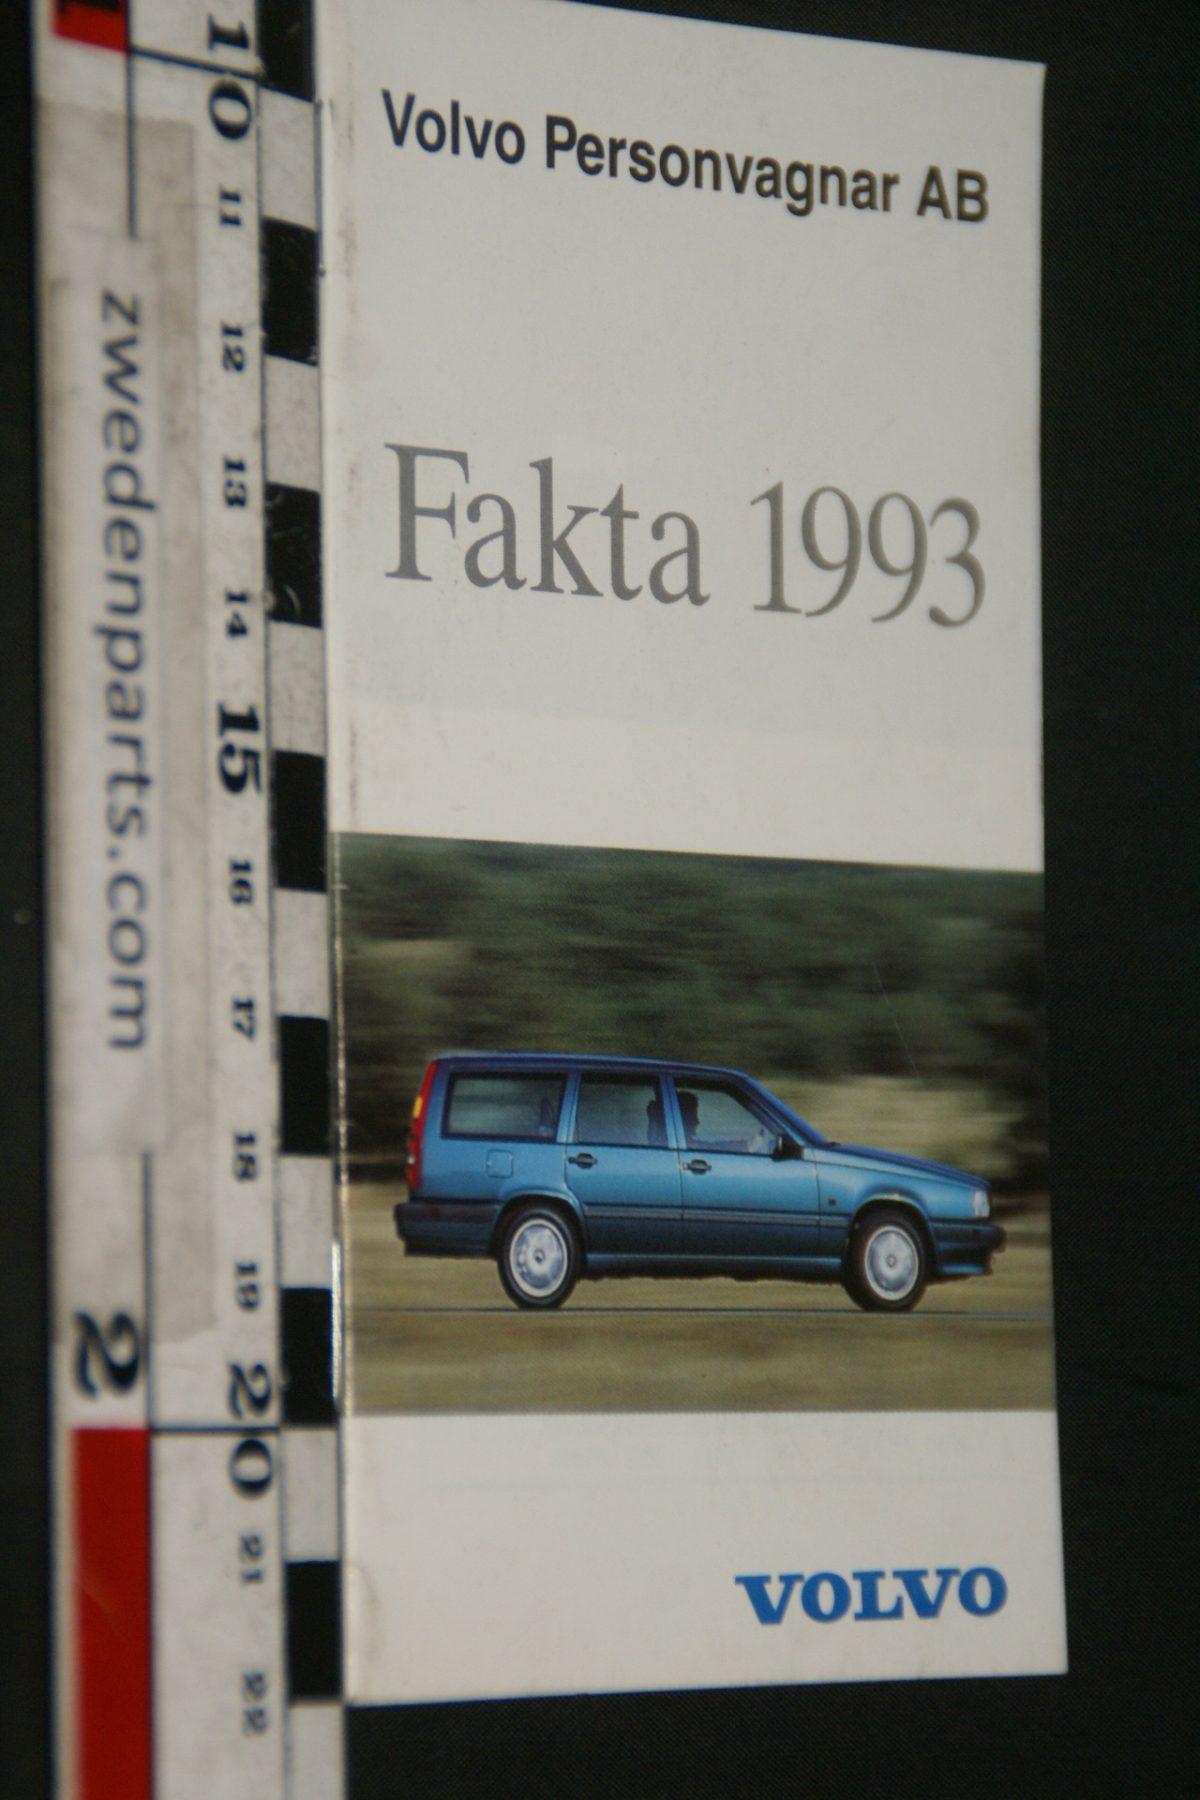 DSC04943 1993 boekje met Volvo feiten